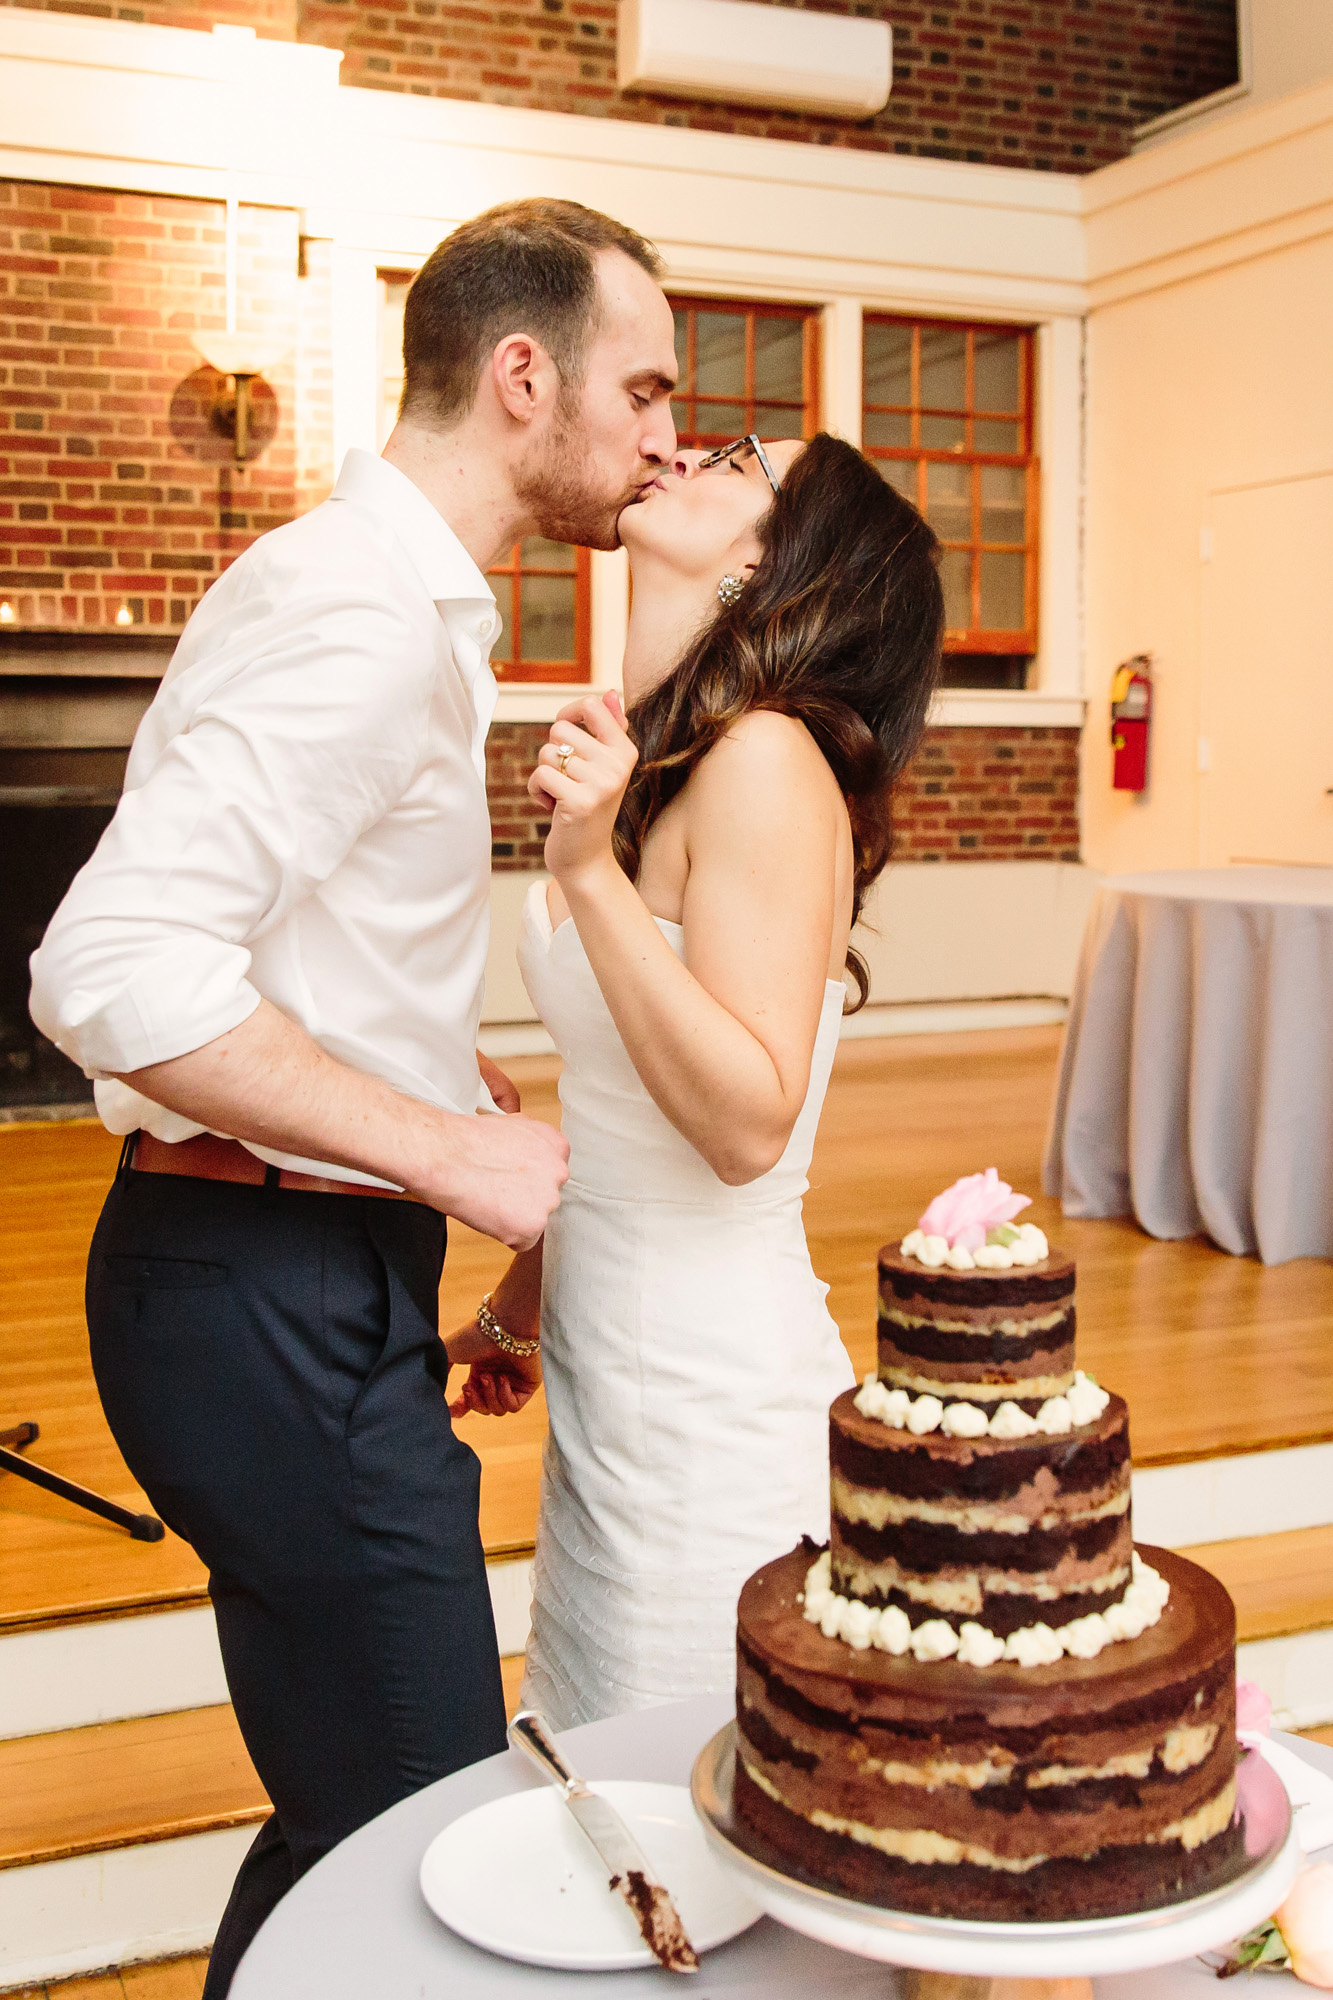 49_Kate_Sam_Picnic_House_Wedding_Brooklyn_NY_Tanya_Salazar_Photography_1075.jpg